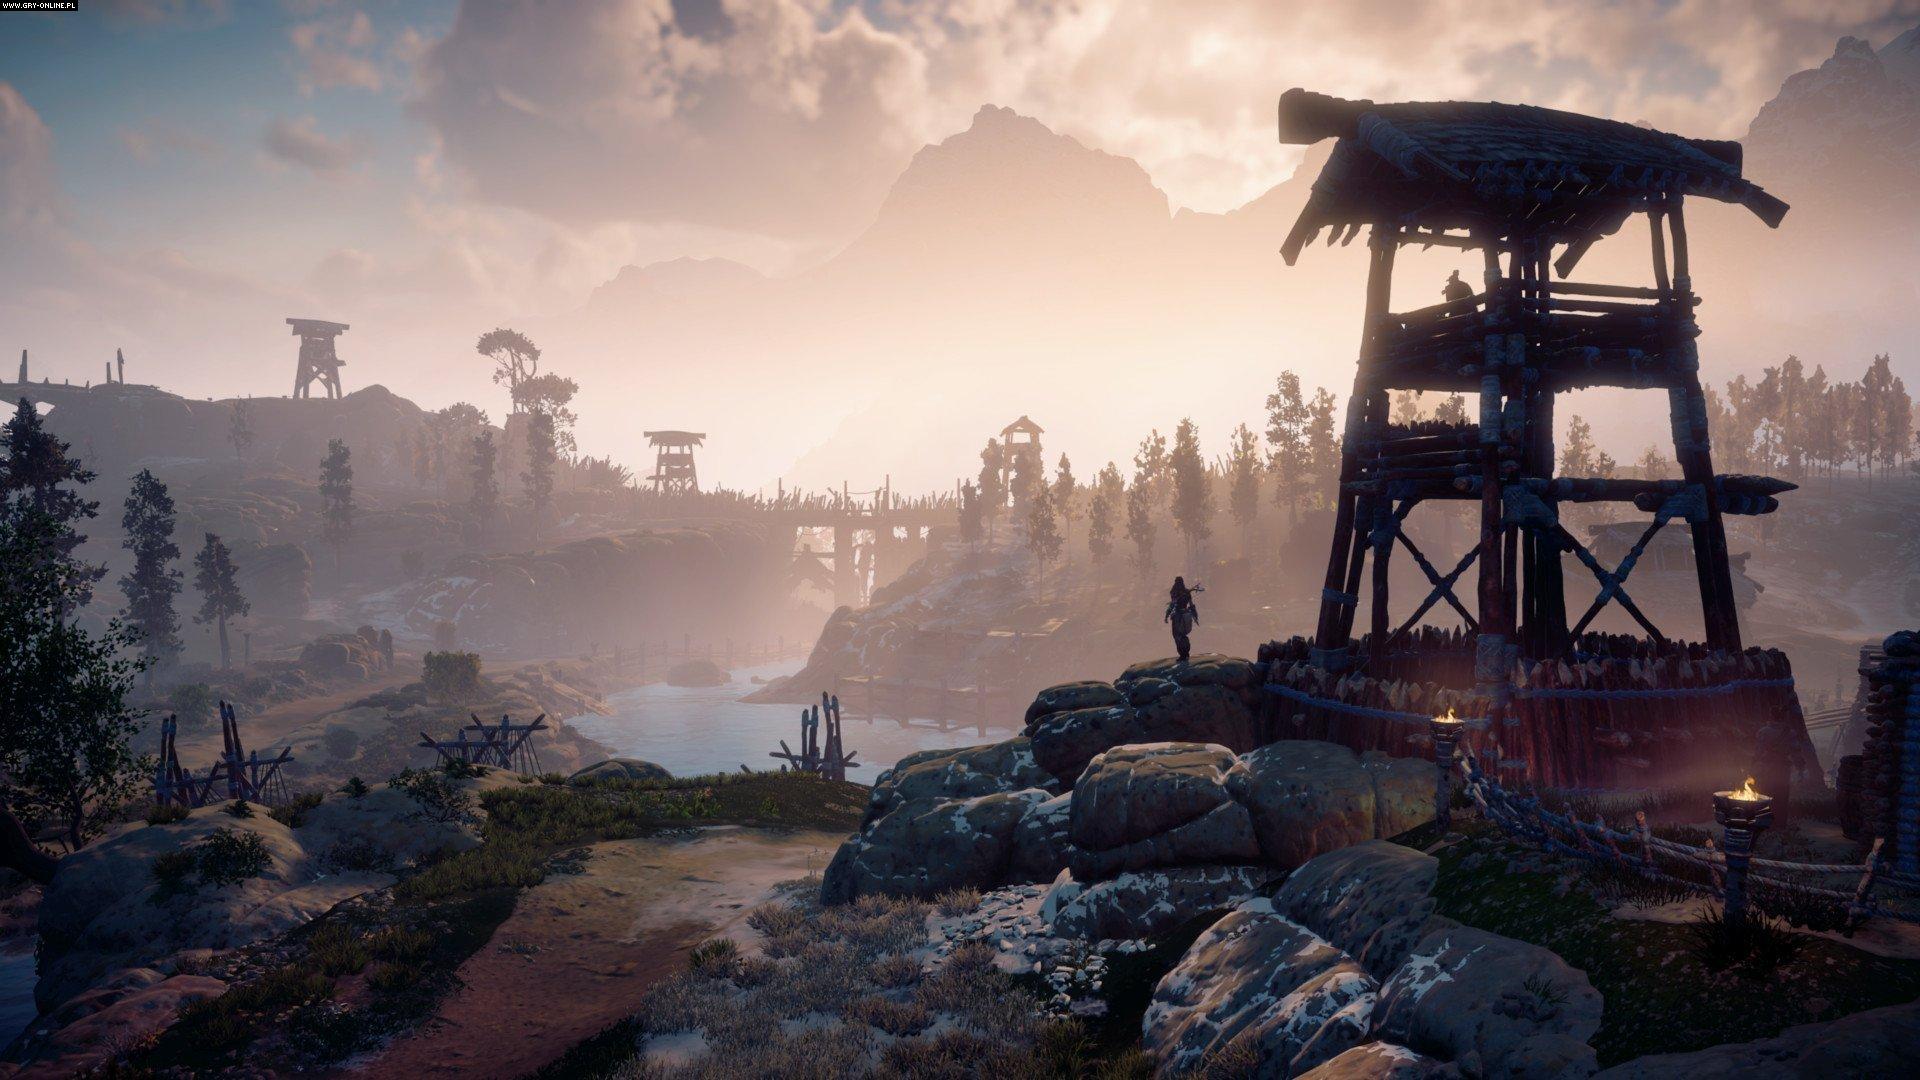 Horizon Zero Dawn PS4 Games Image 7/54, Guerrilla Games, Sony Interactive Entertainment